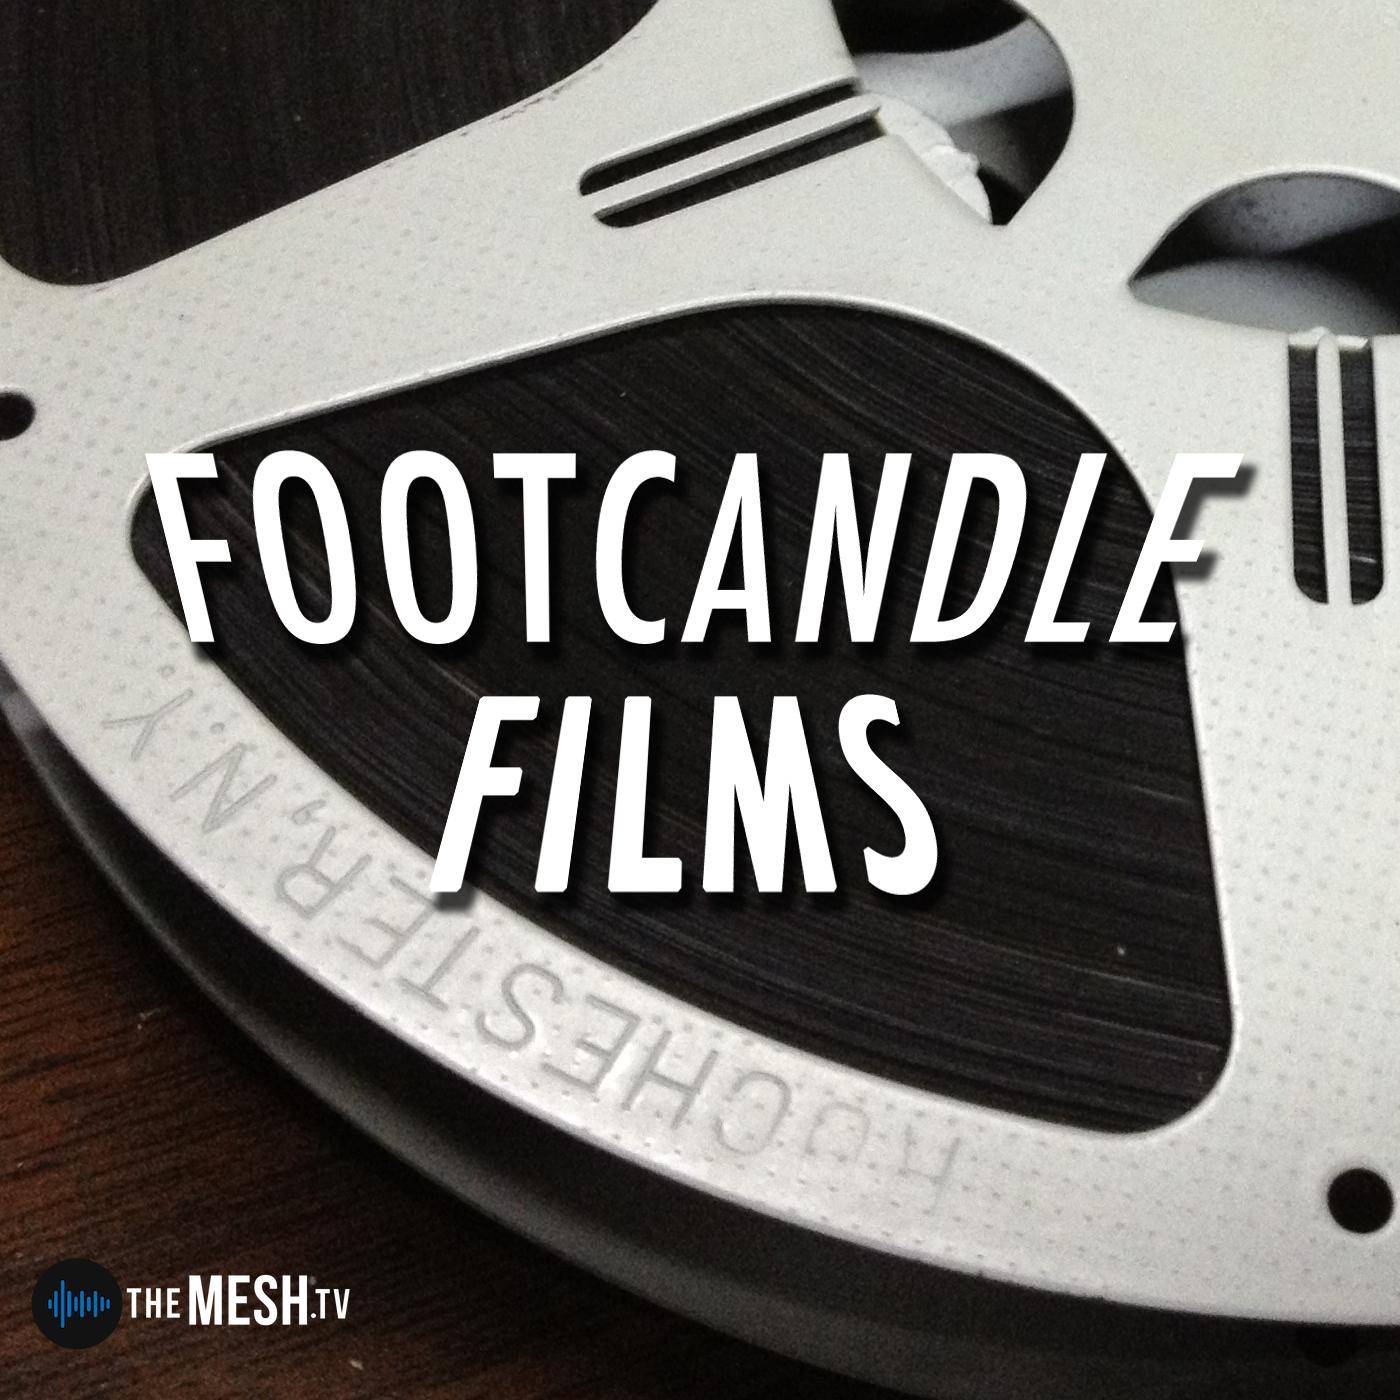 Footcandle Films show art